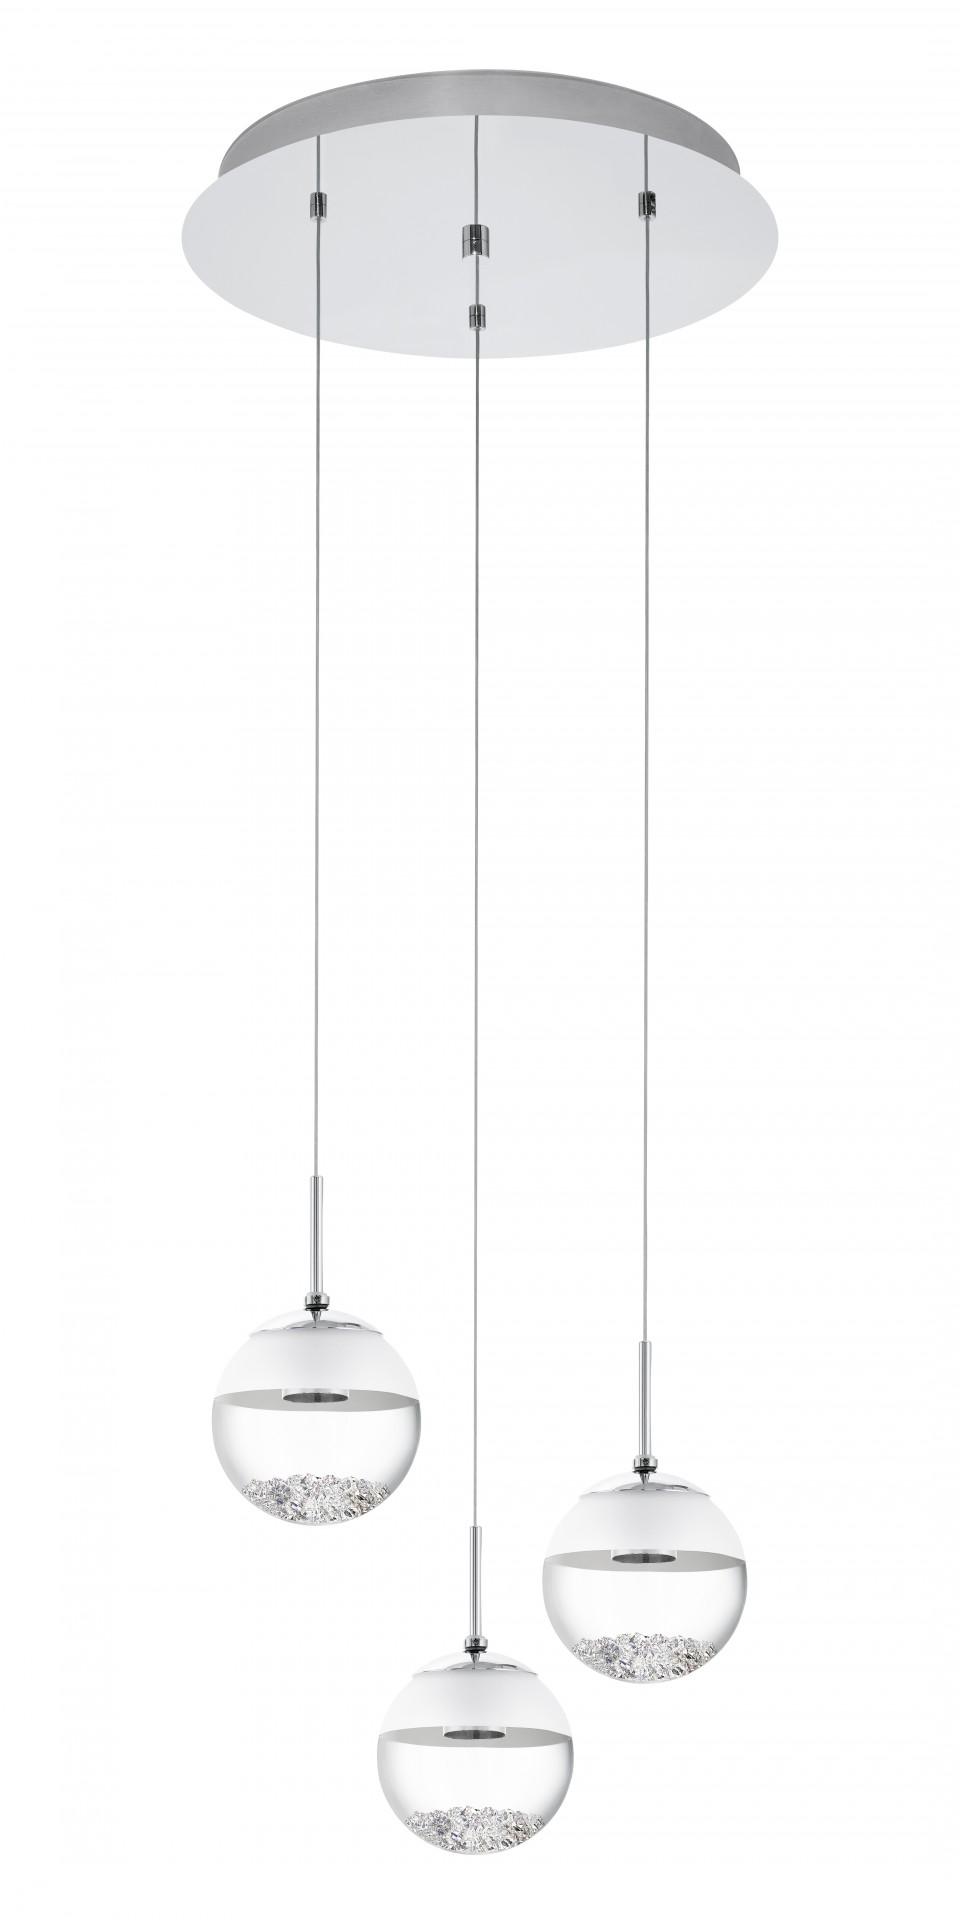 Светильник подвесной Eglo Montefio 93709  eglo 93709